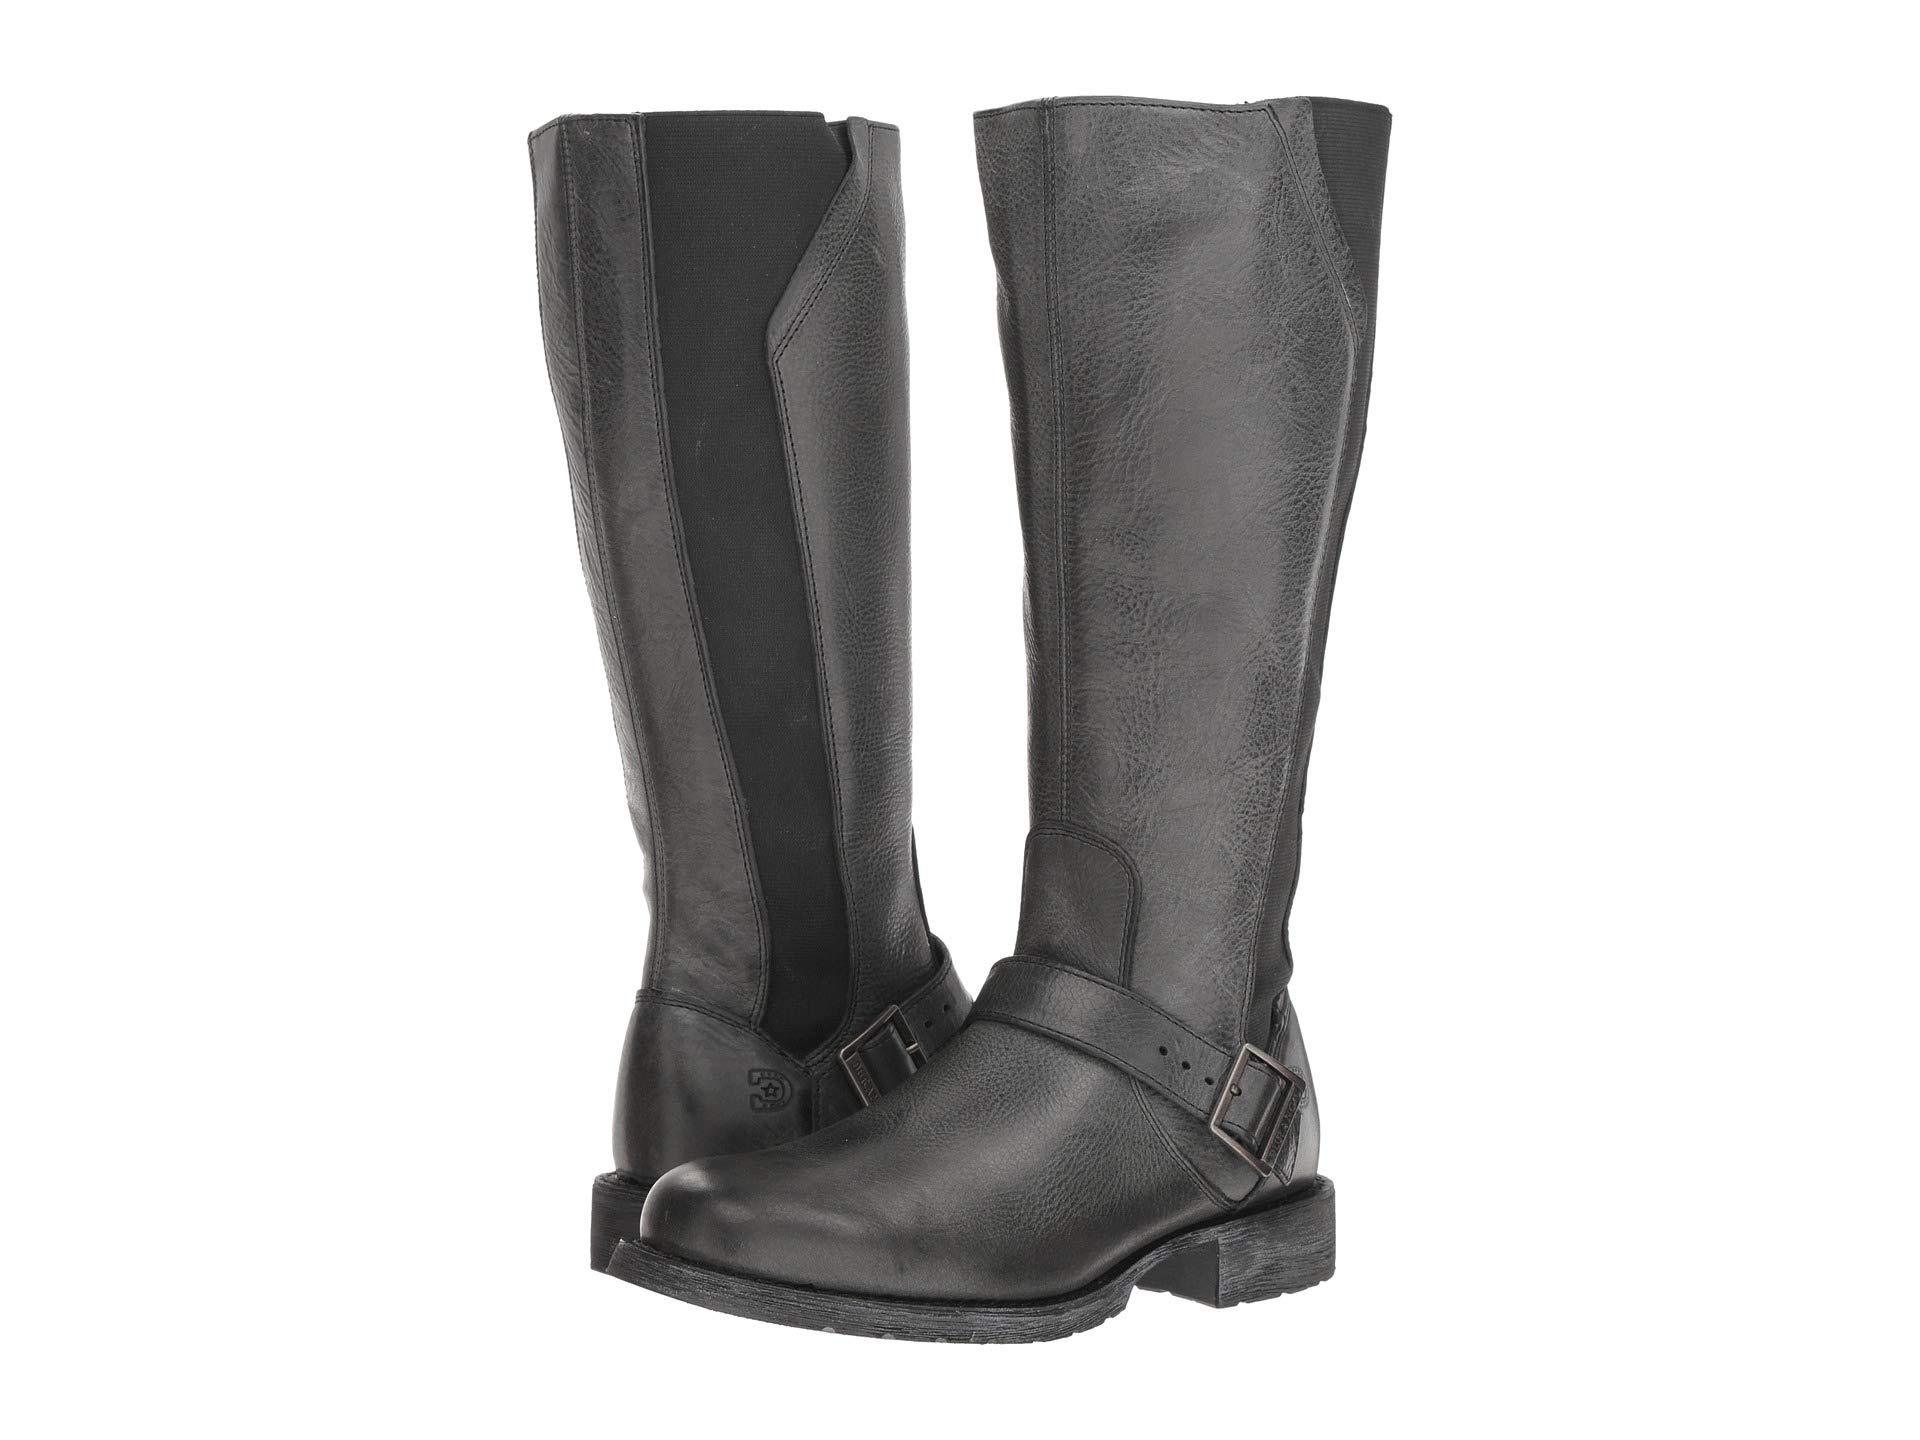 8ff782d1f Lyst - Durango Crush 15 Riding Boot (chestnut Brown) Women's Boots